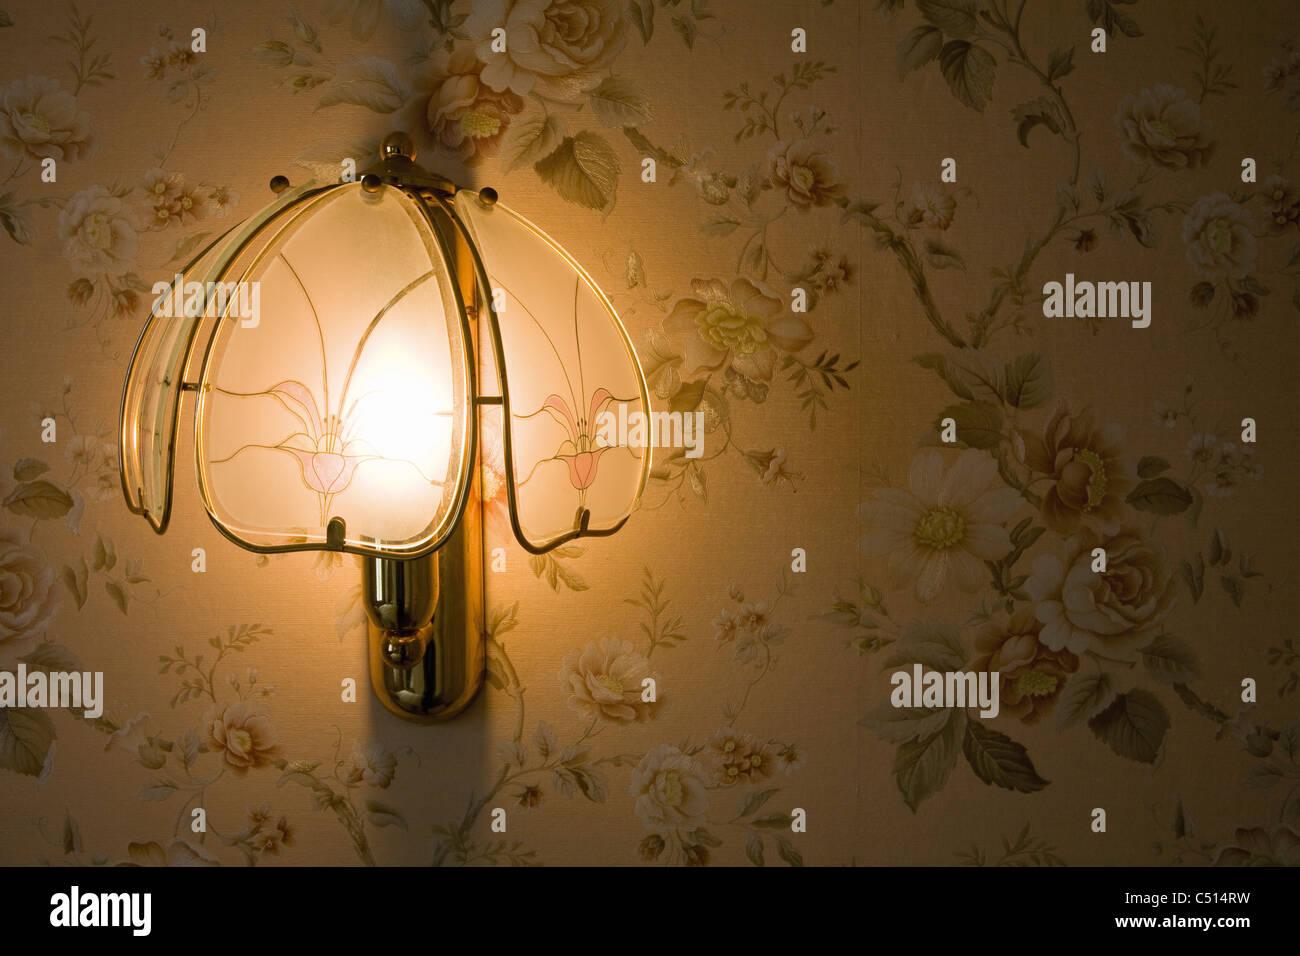 Decorative wall light illuminated at night Stock Photo